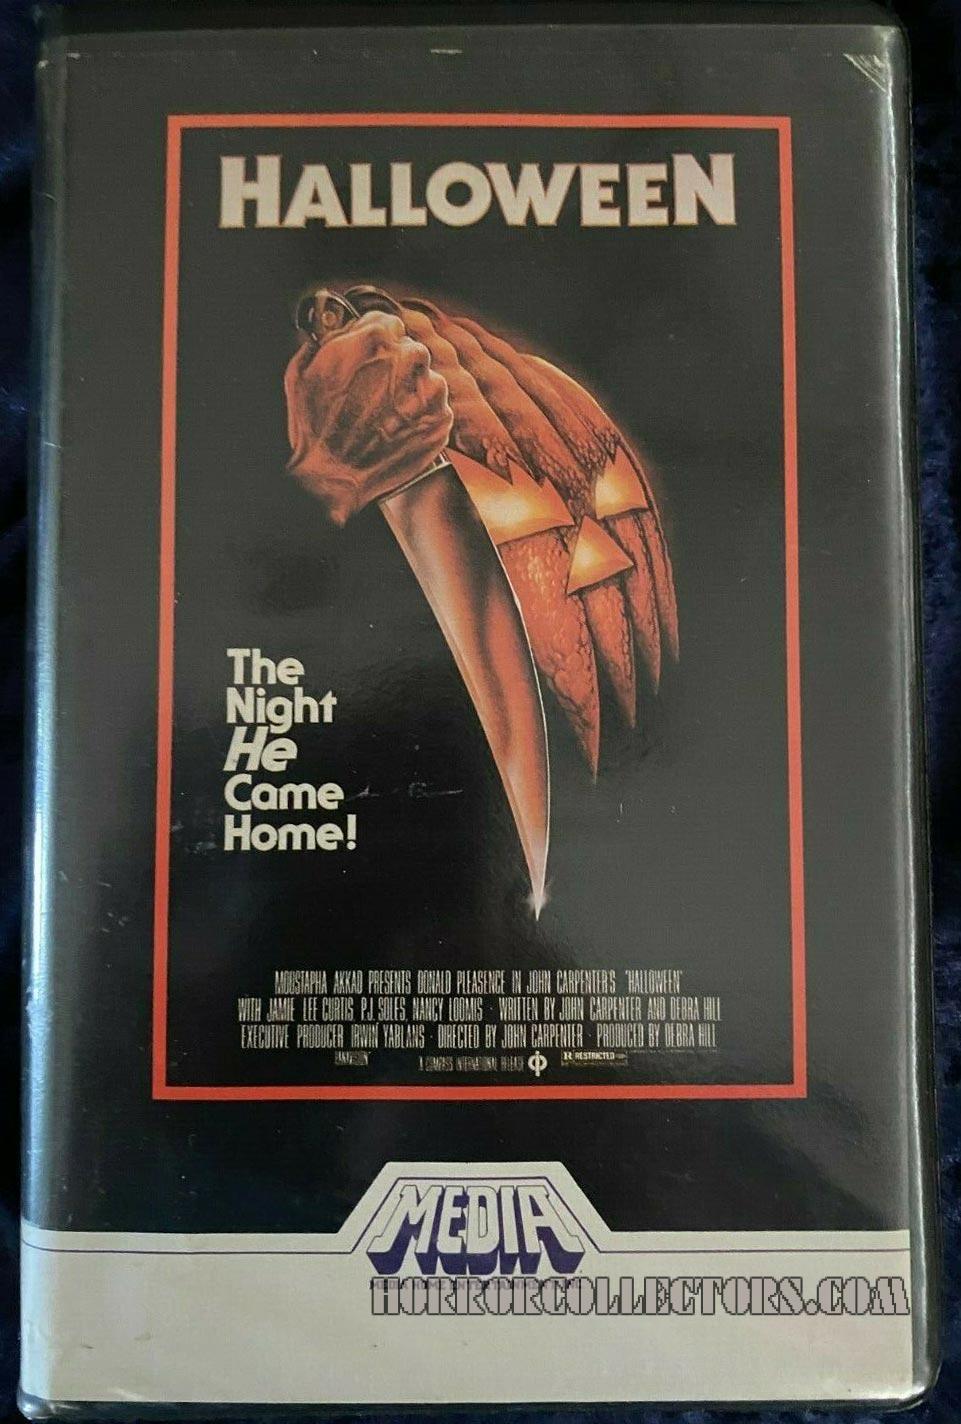 Halloween Media Home Entertainment Video